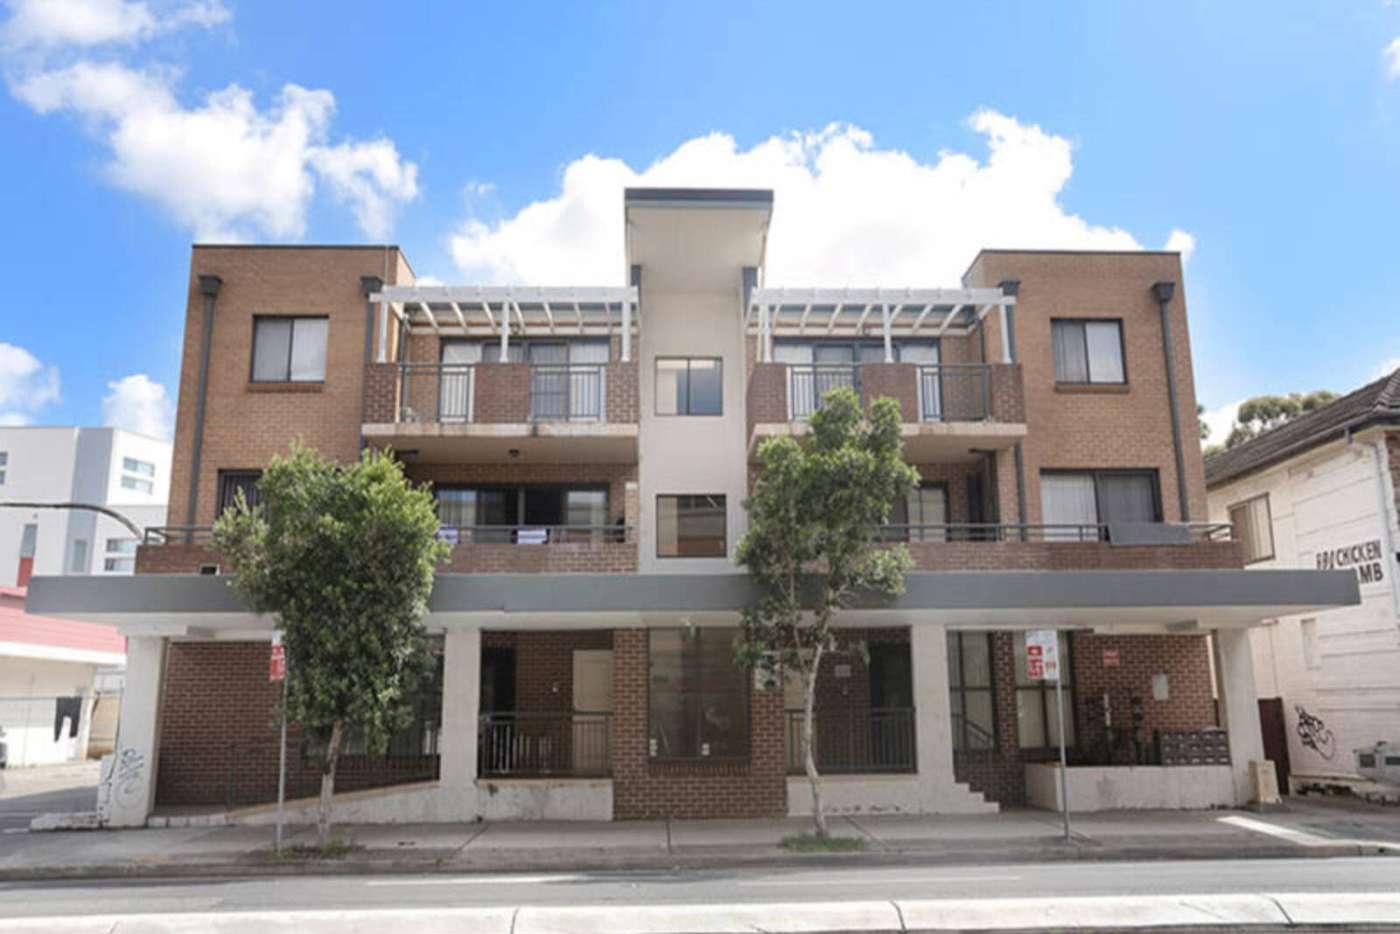 Main view of Homely apartment listing, 5/5-7 Cornelia Road, Toongabbie NSW 2146